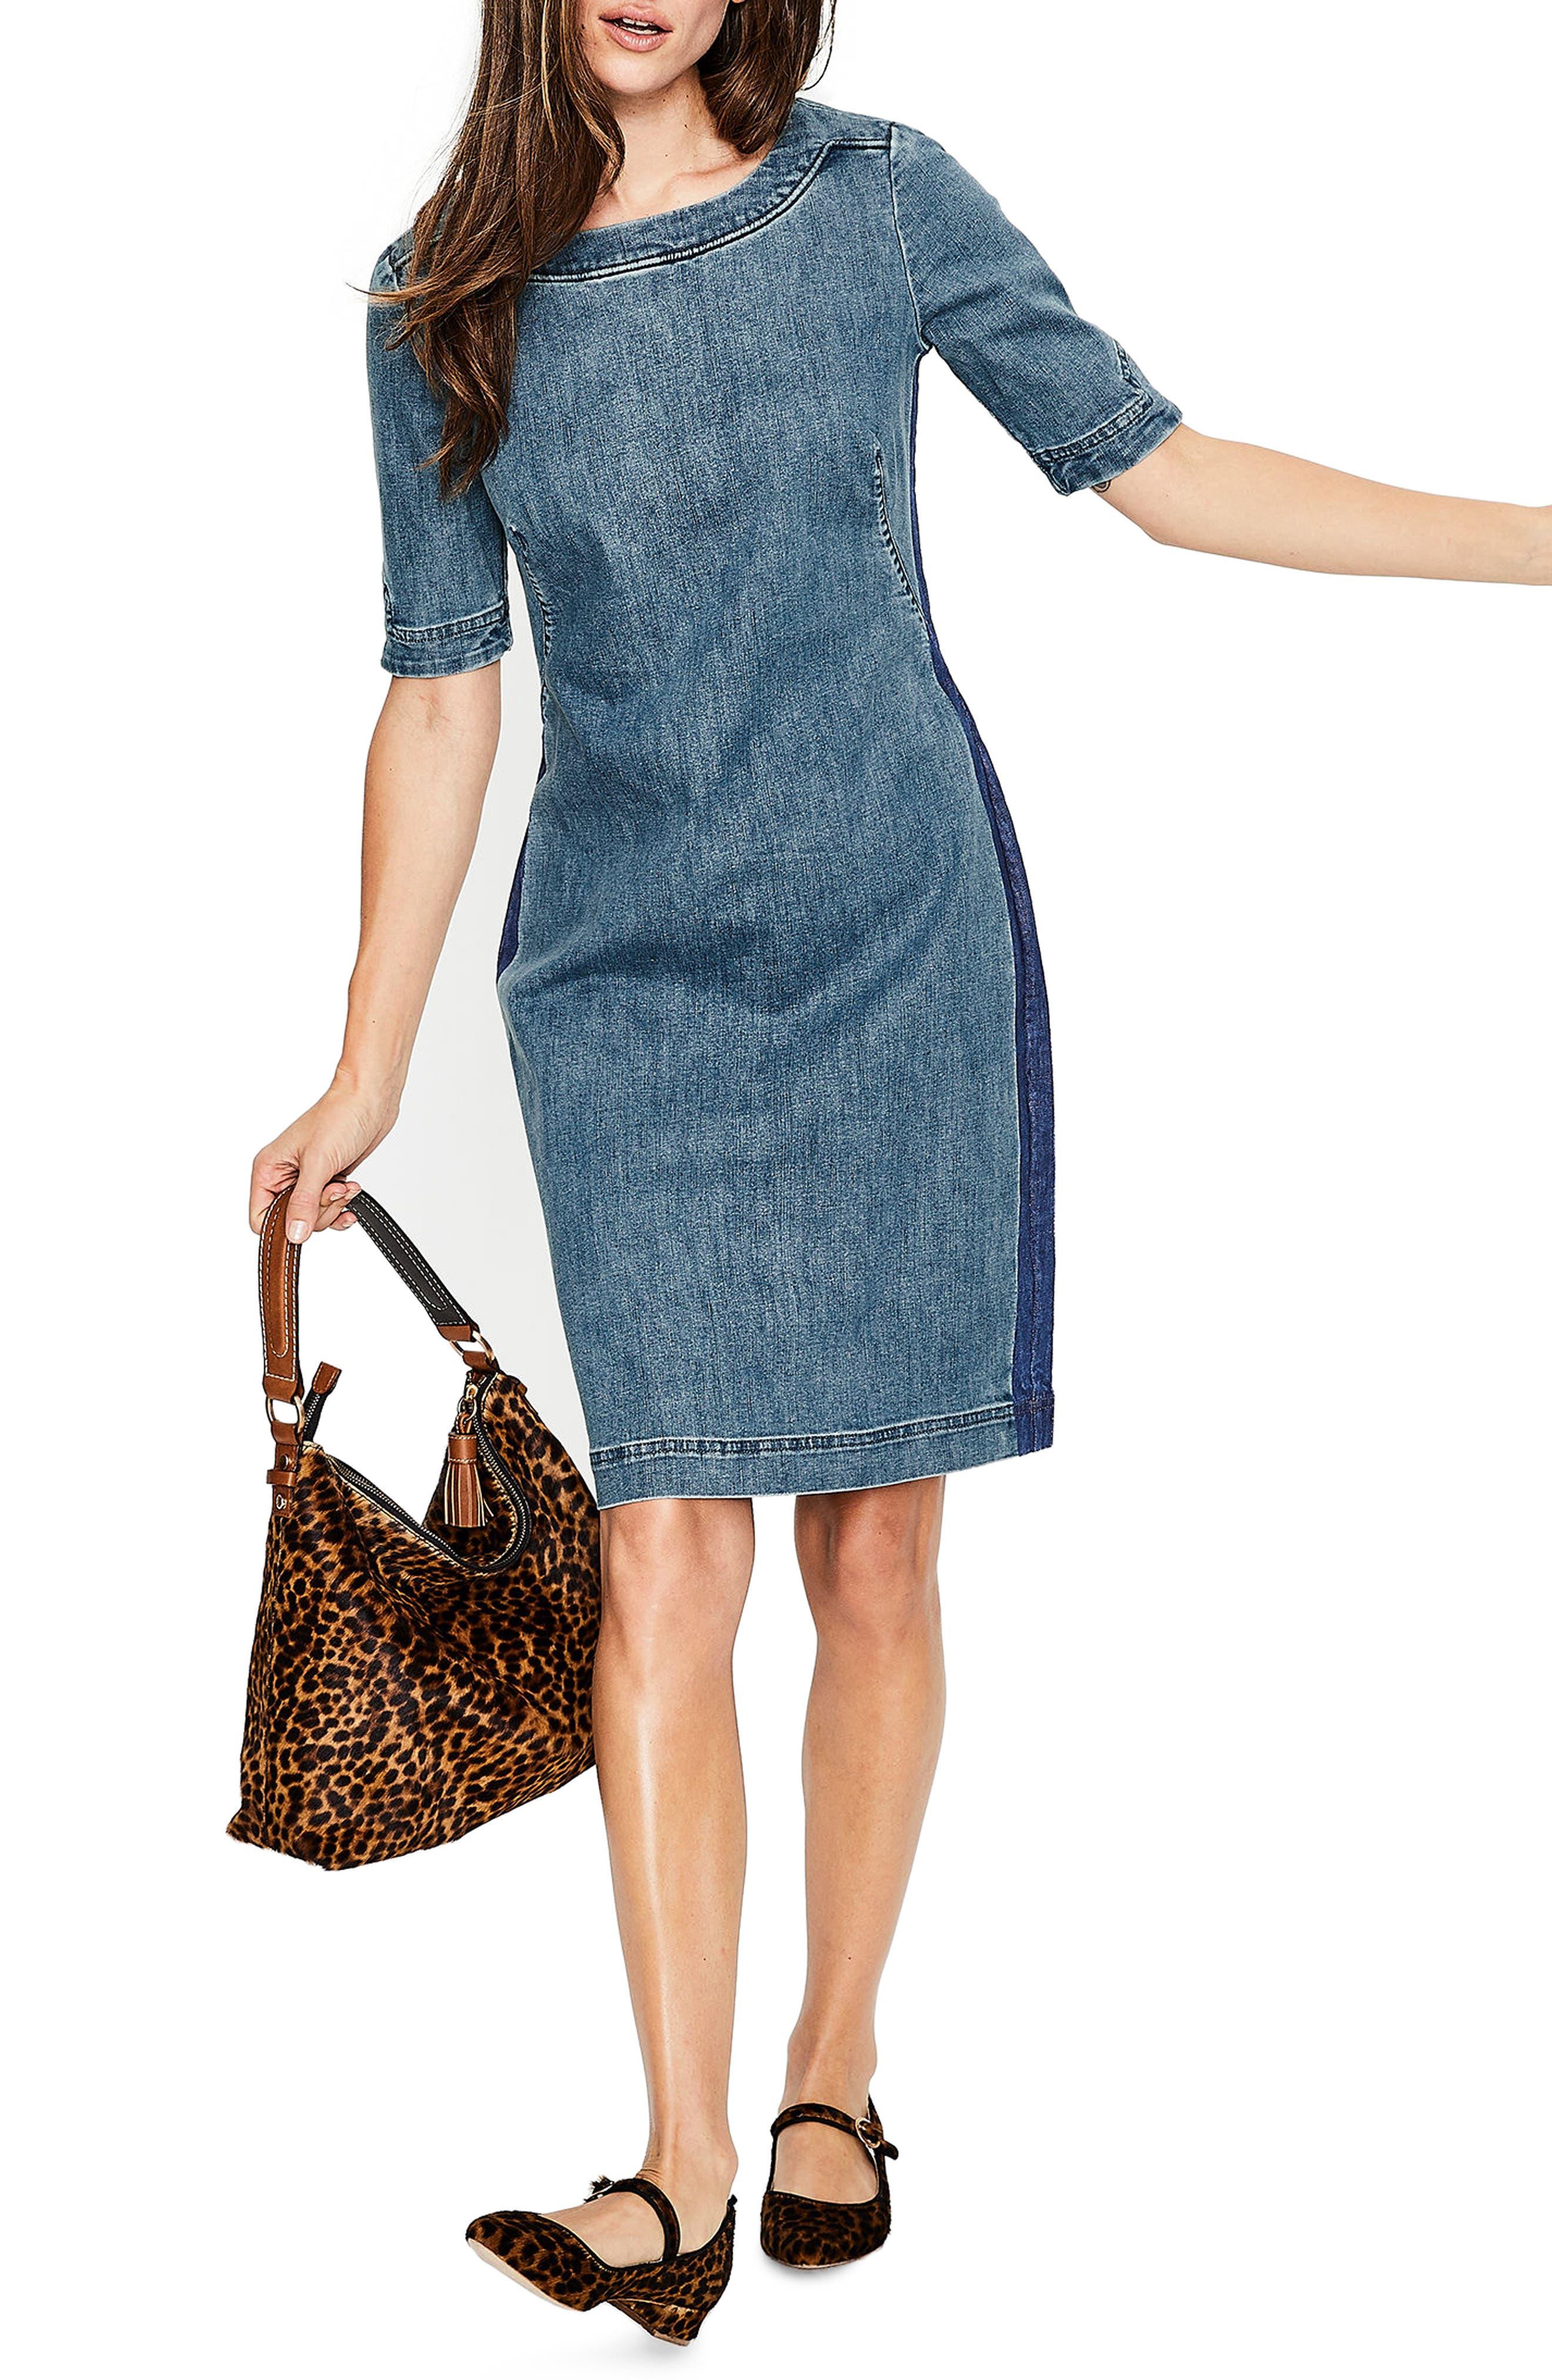 Rhea Denim Contrast Dress,                             Main thumbnail 1, color,                             MID VINTAGE WITH SIDE STRIPE